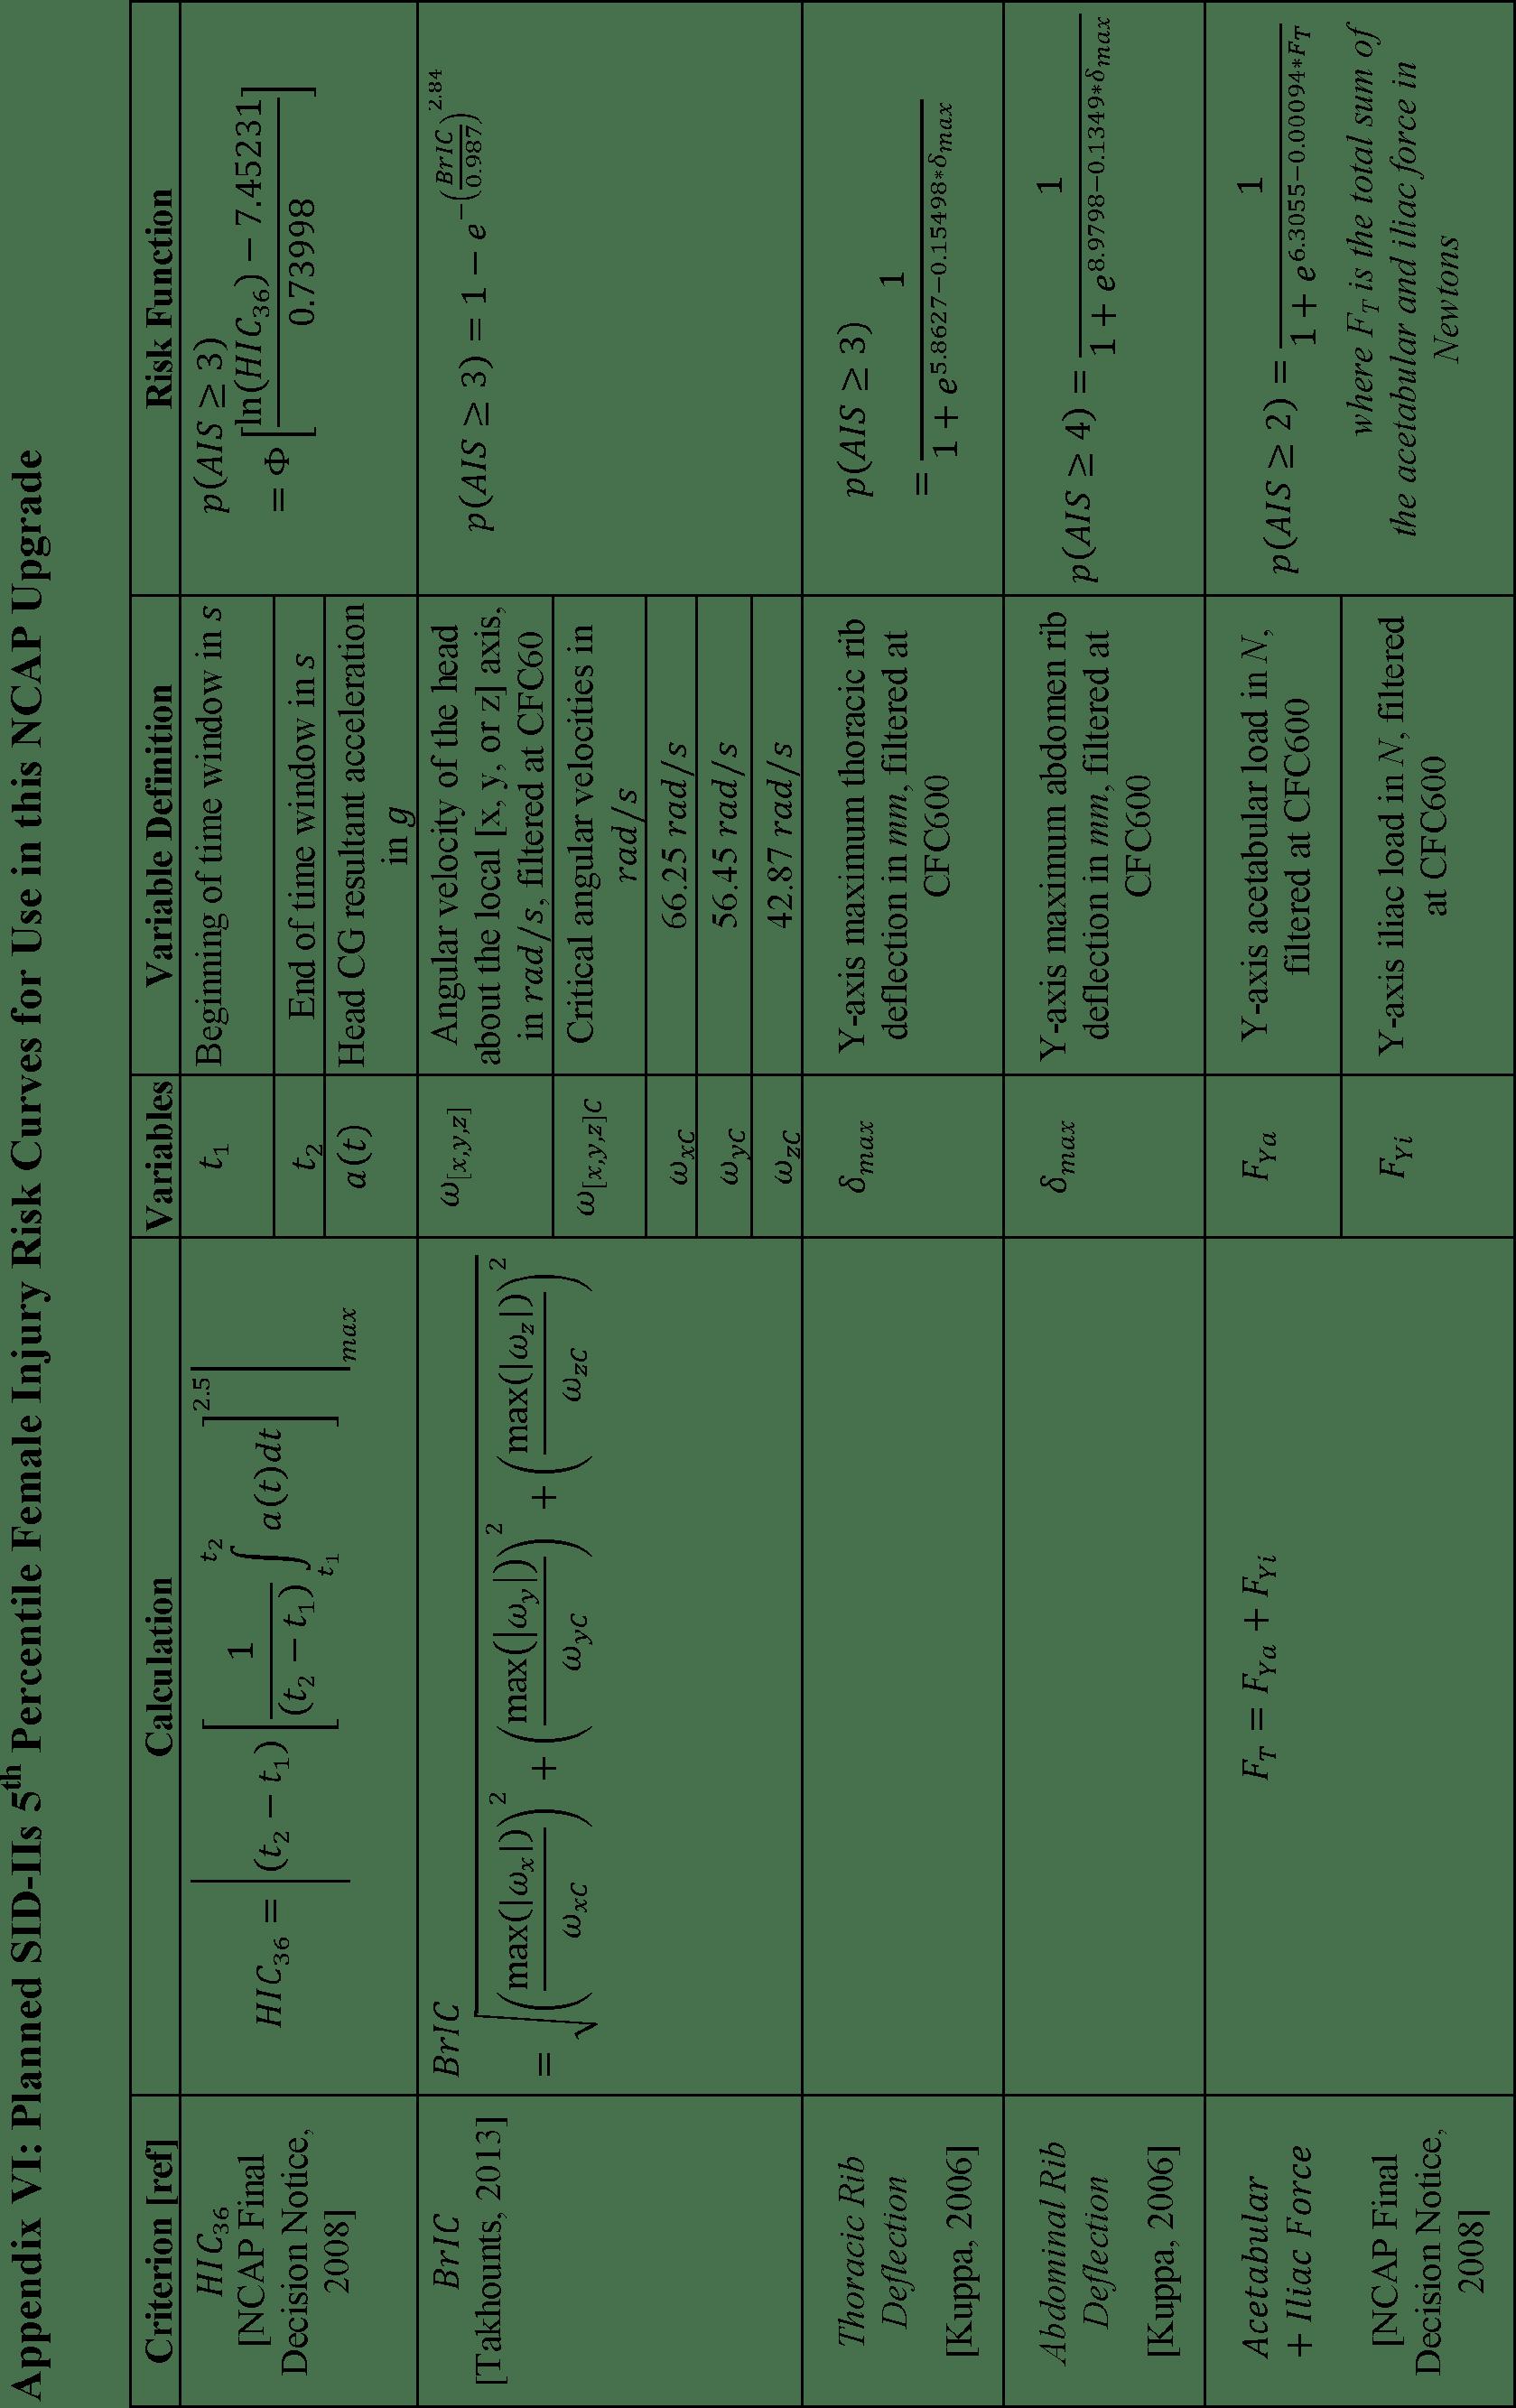 wiring diagram on 1979 federal register new car essment program on 1979 jeep wagoneer 1980 jeep cj7  [ 1679 x 2667 Pixel ]